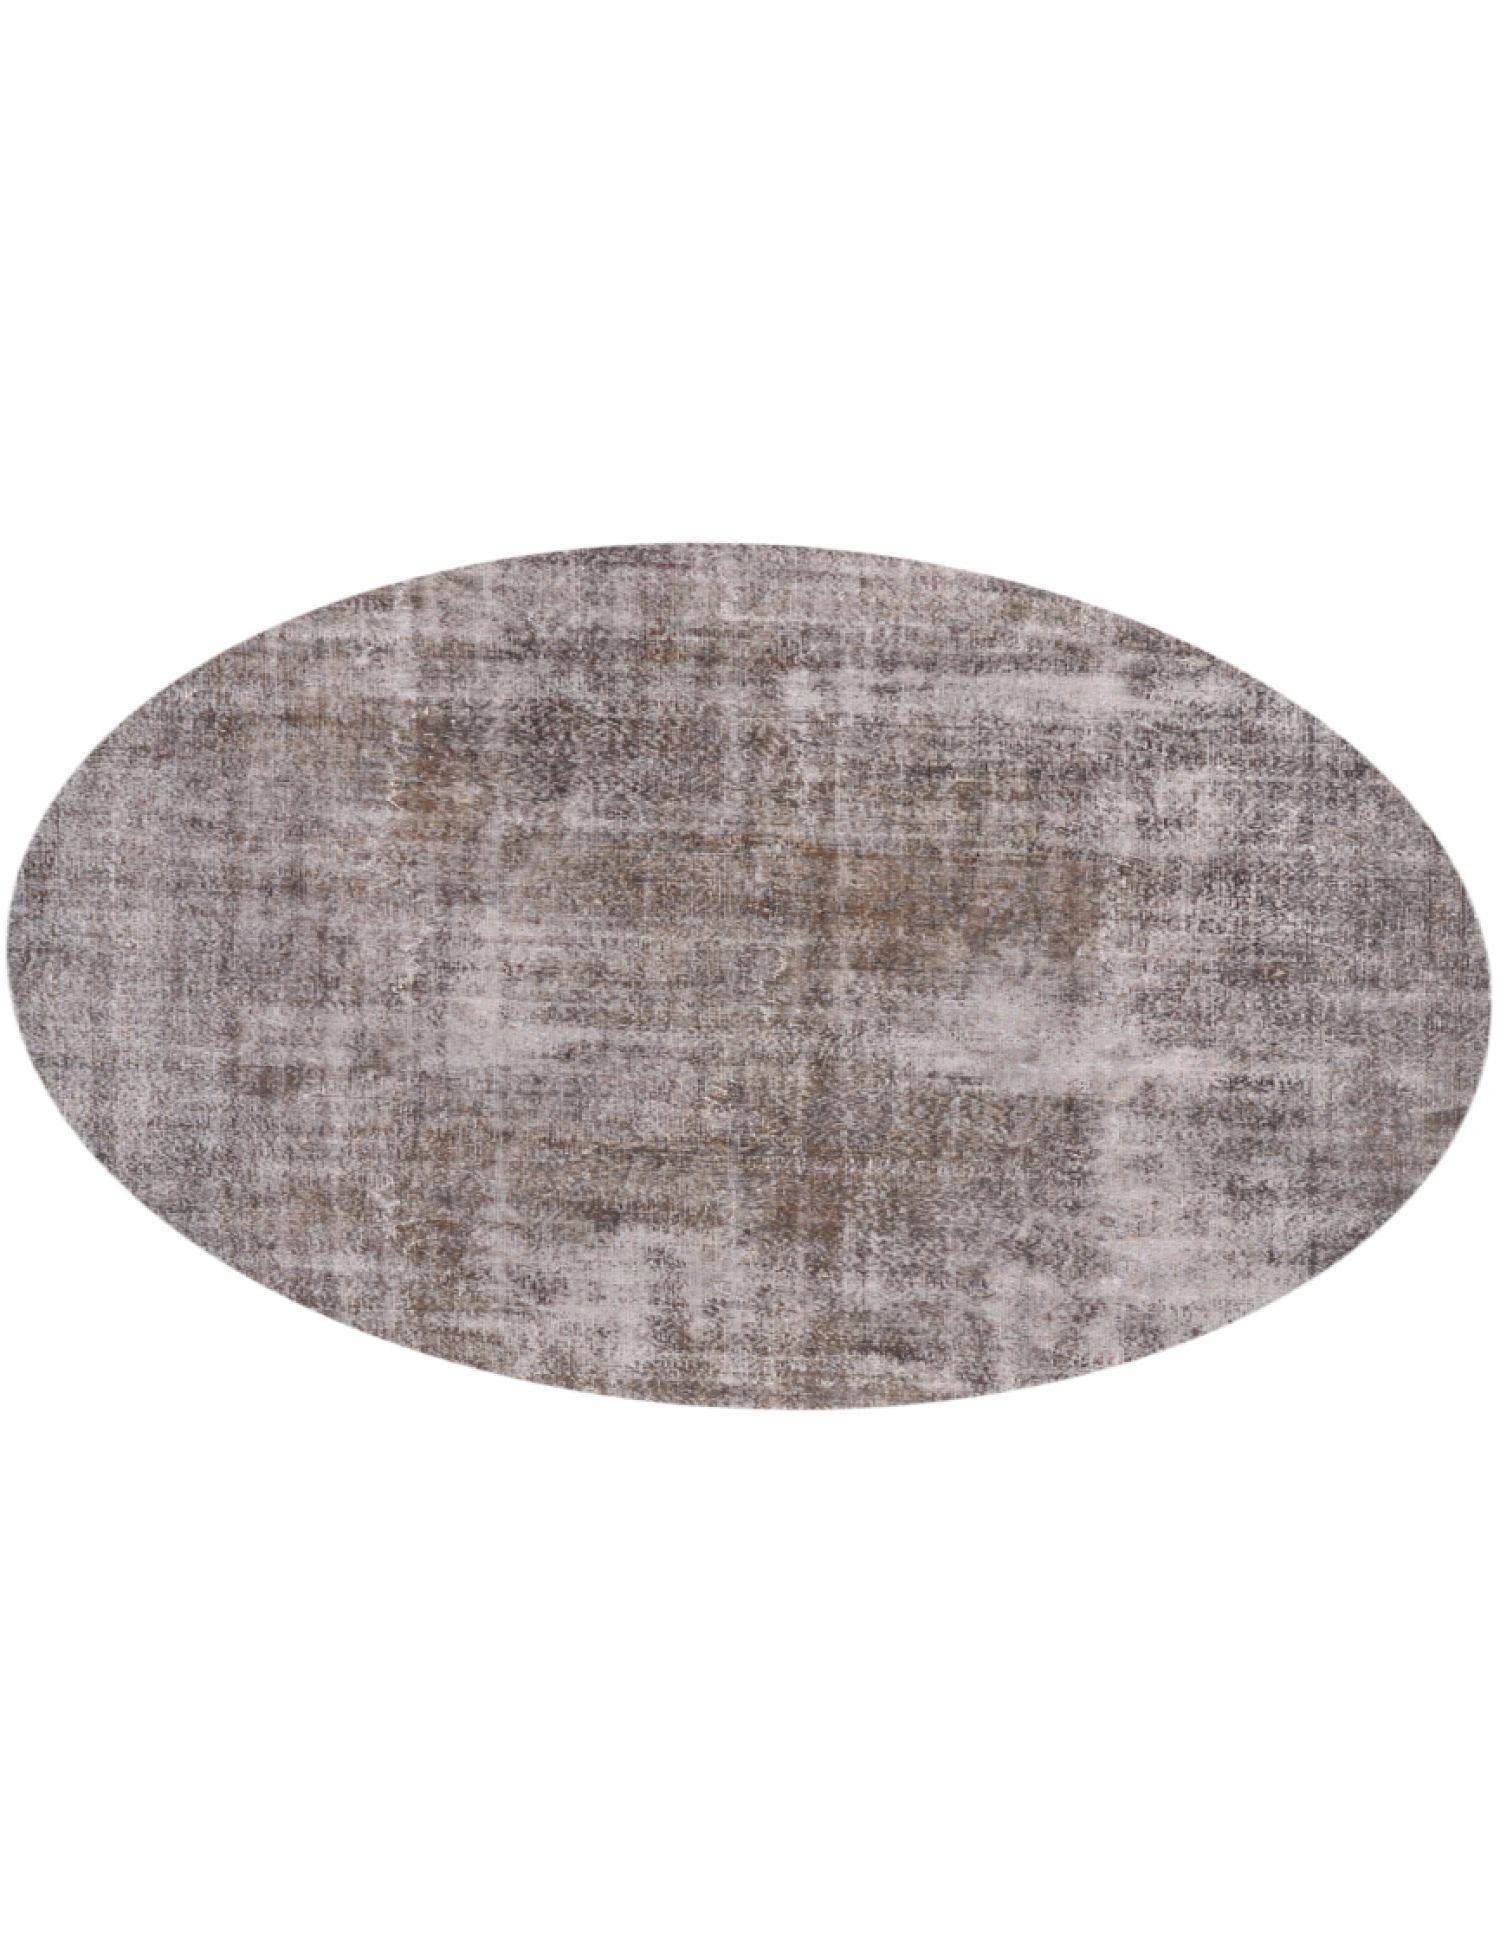 Tappeto Vintage  grigio <br/>242 x 242 cm